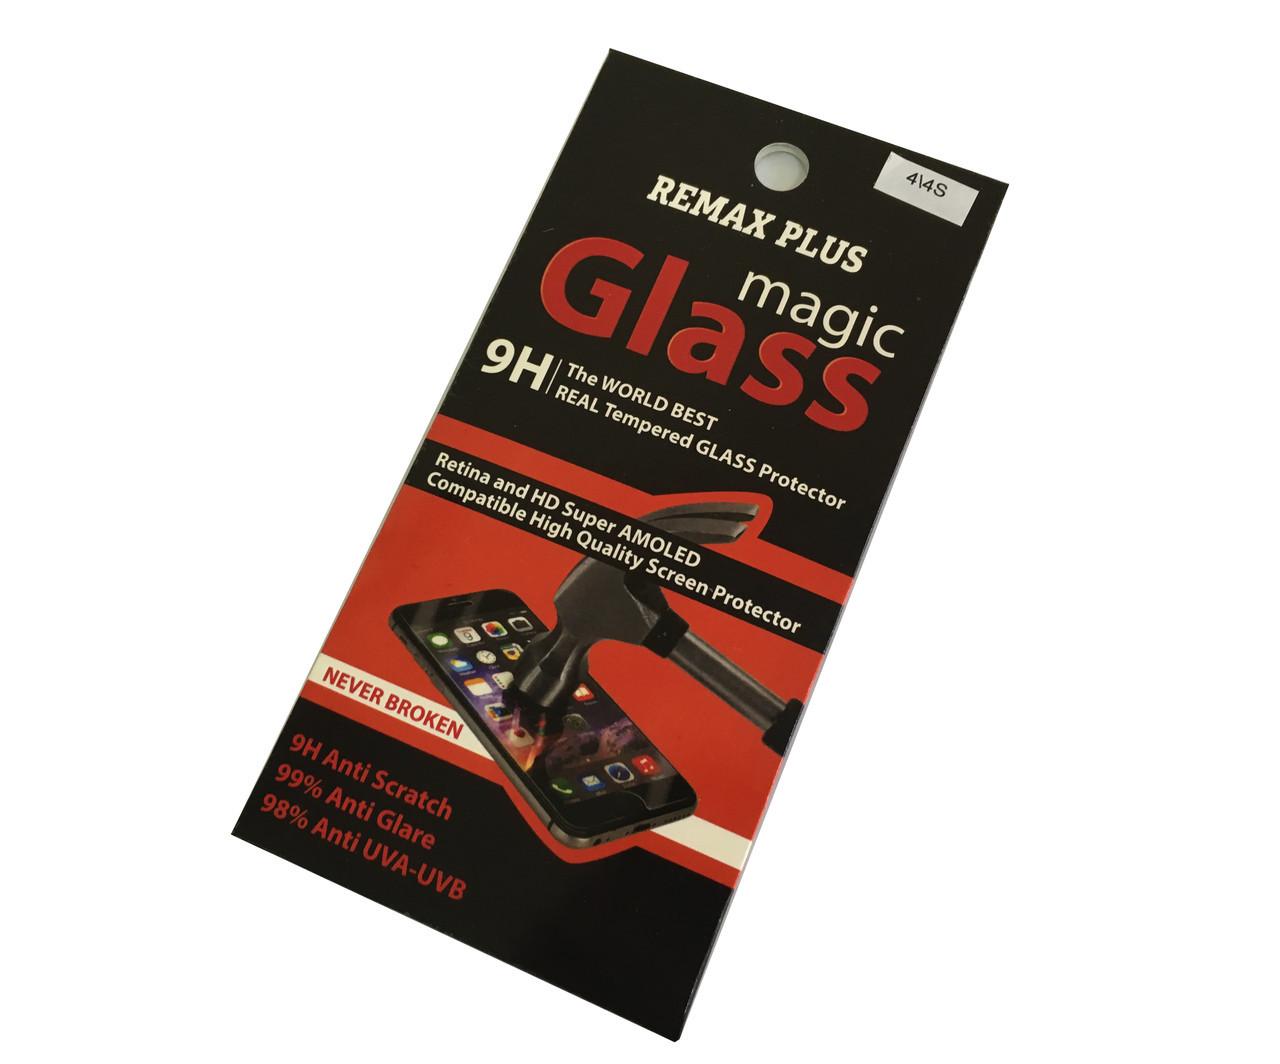 Защитное стекло Remax plus Magic Glass для iPhone 4/4s (0.2мм)